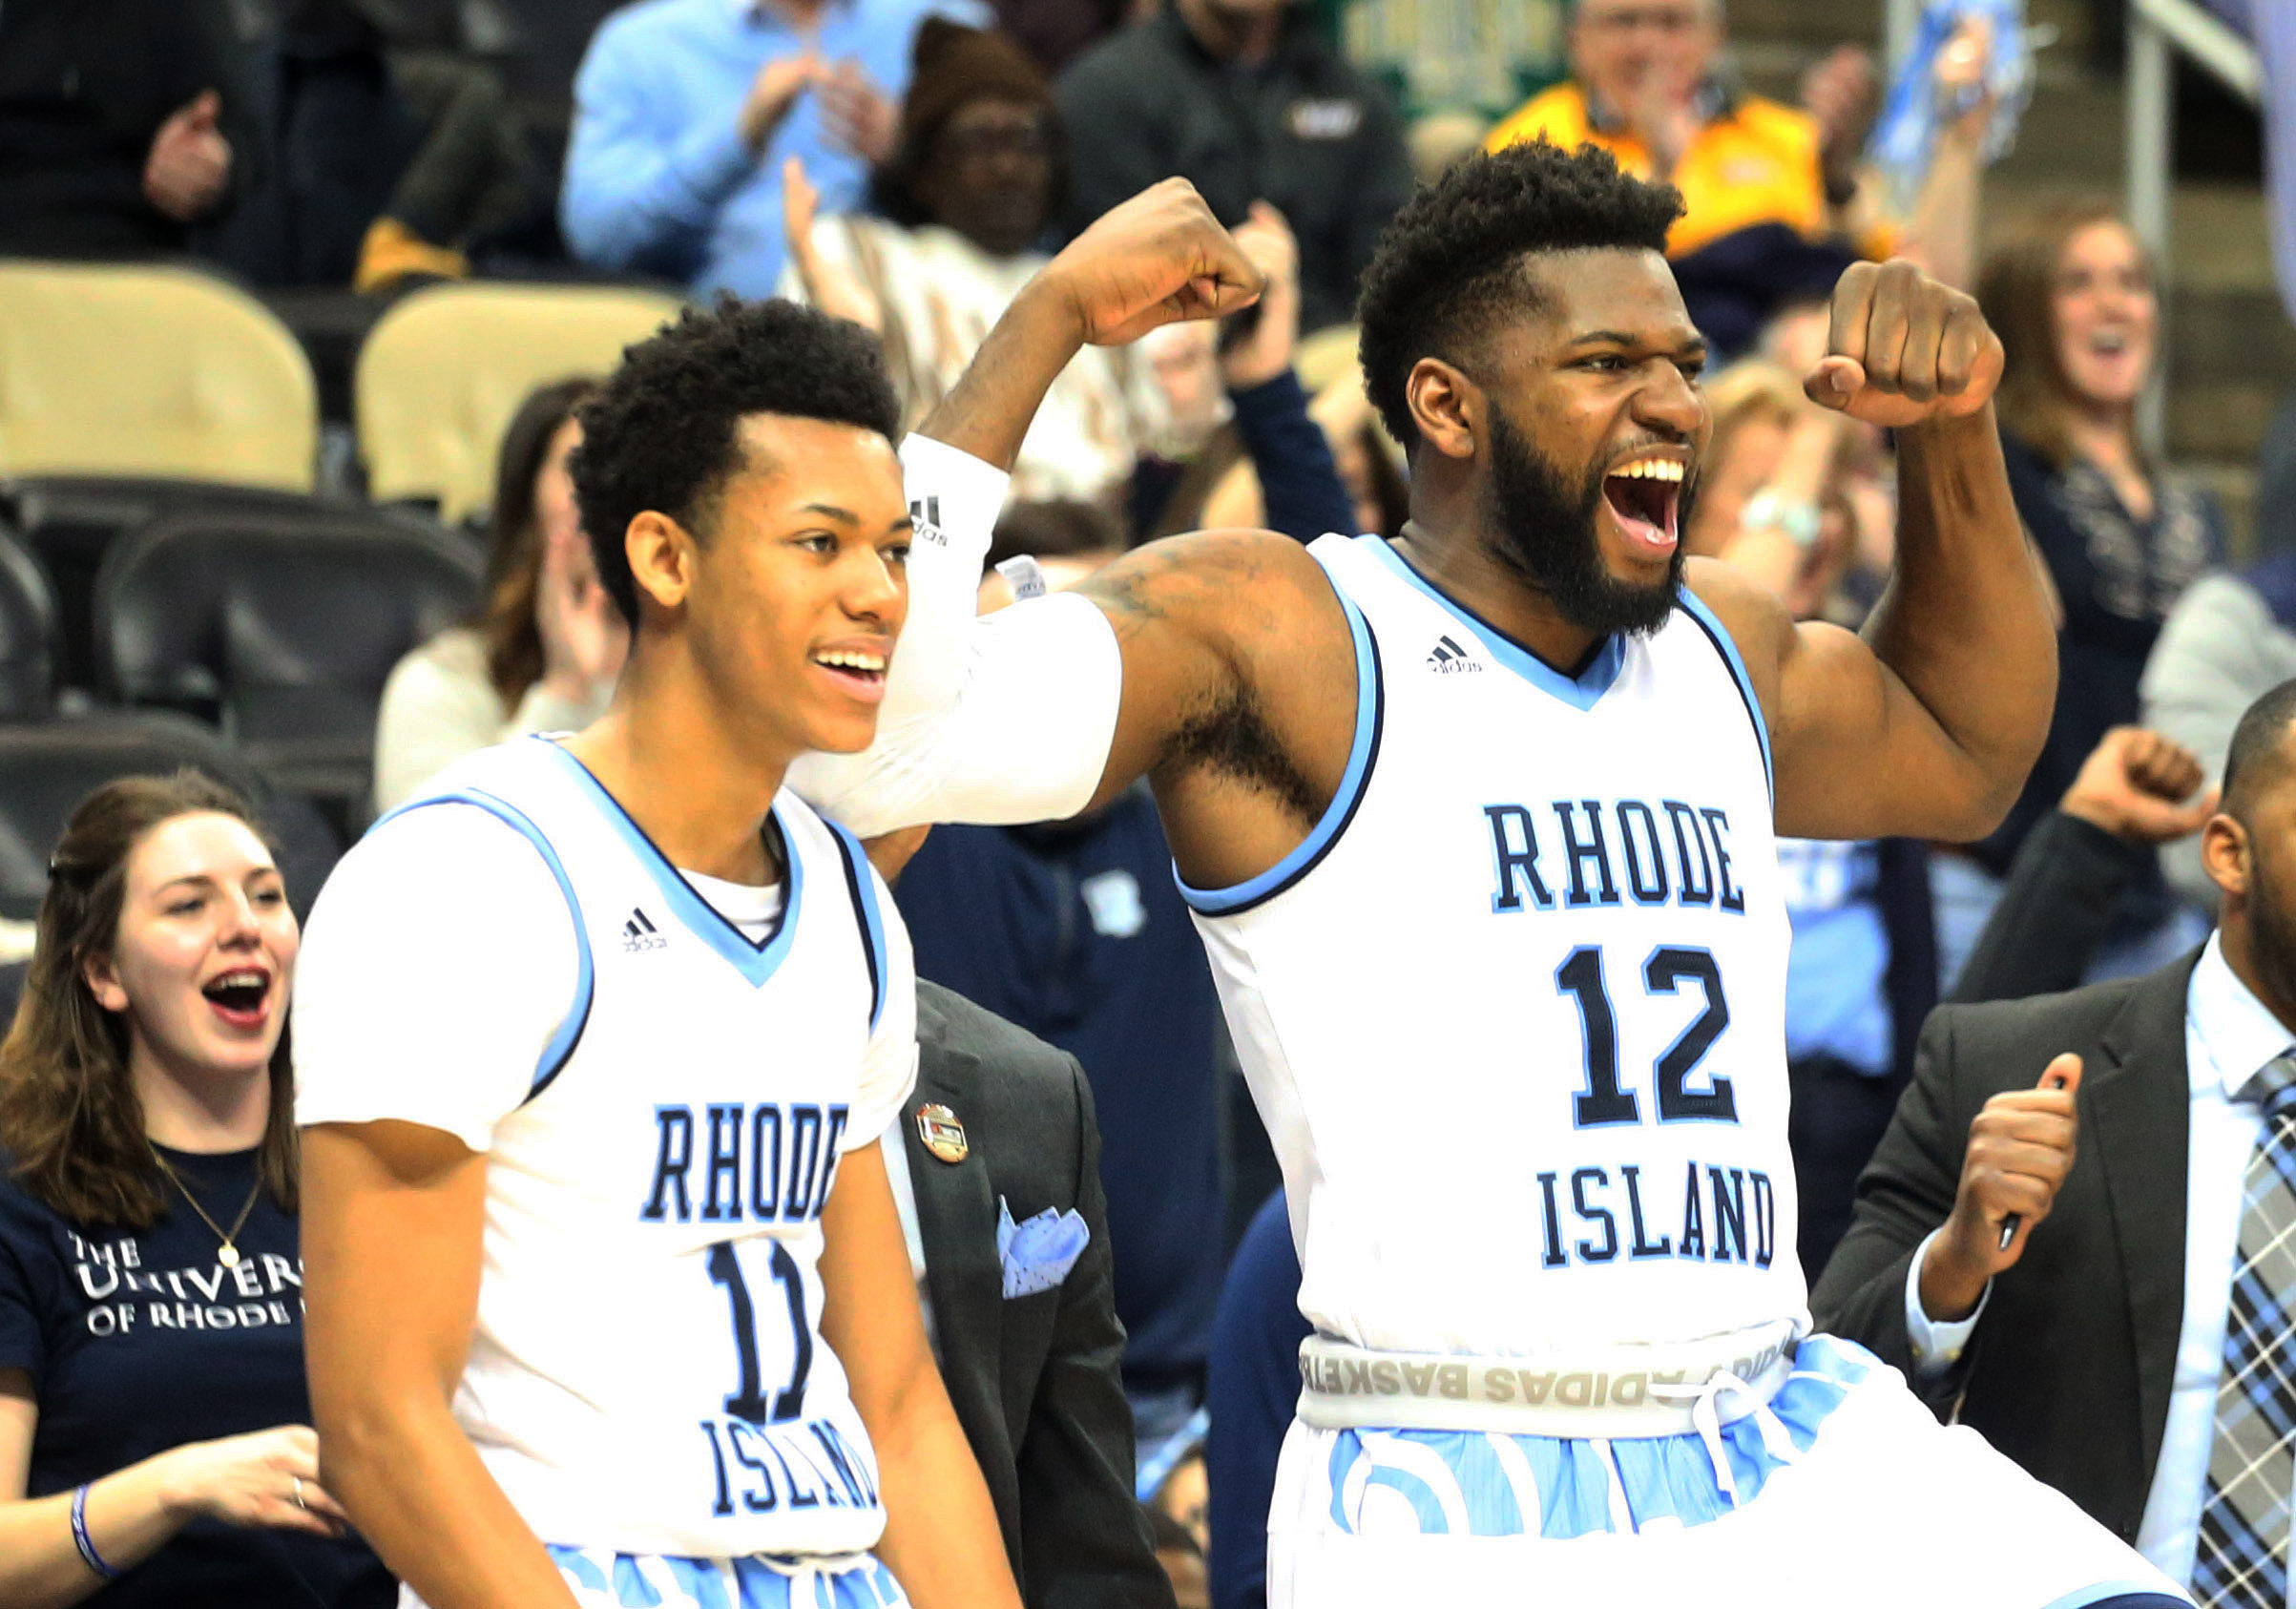 9933657-ncaa-basketball-atlantic-10-conference-tournament-davidson-vs-rhode-island